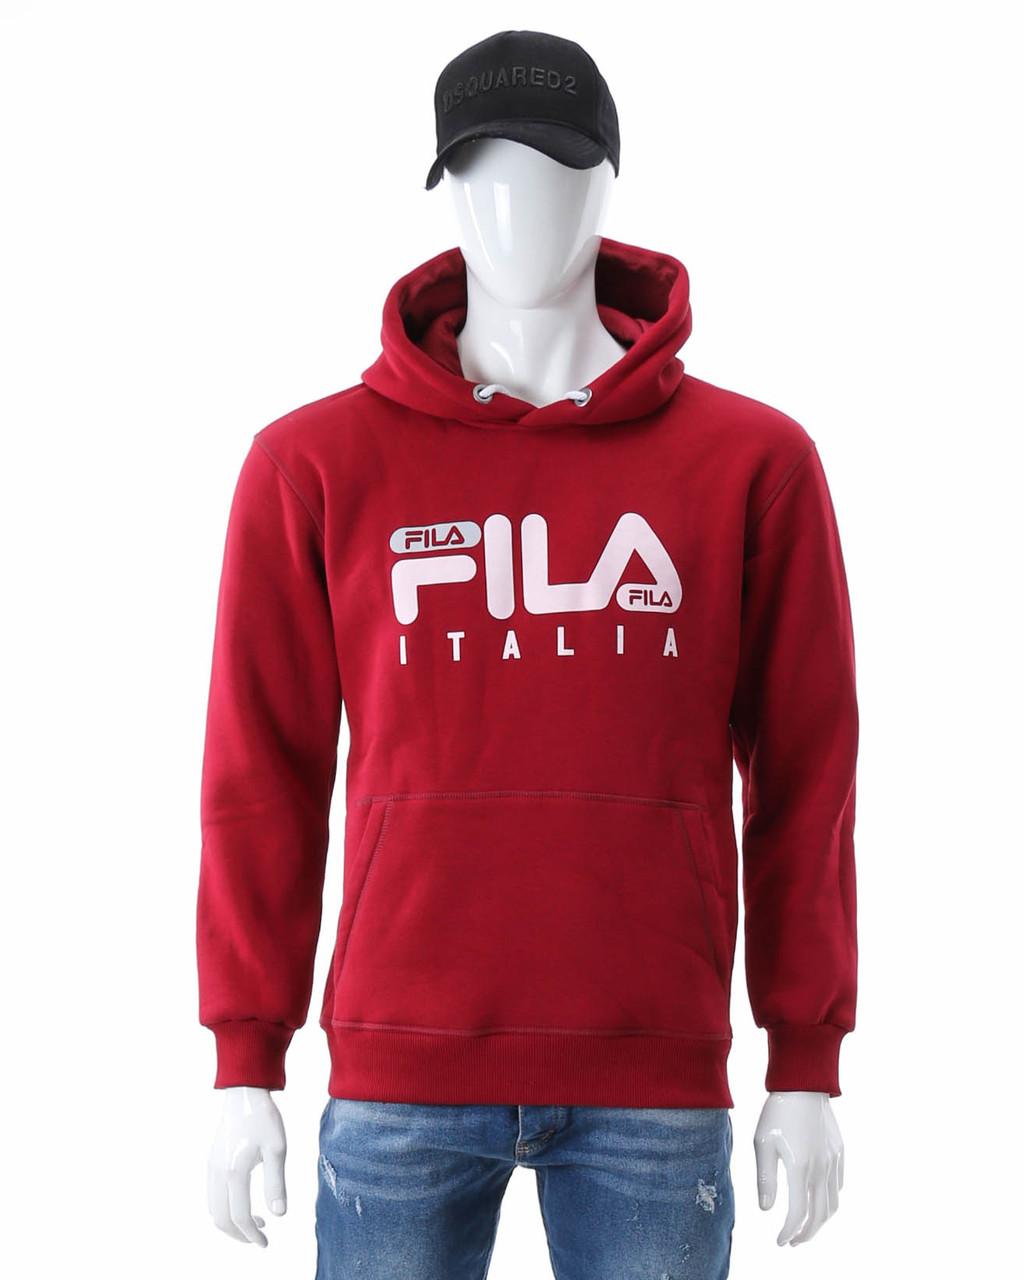 Худи осень-зима бордо FILA ITALIA с лого Т-2 BOR L(Р) 20-478-203